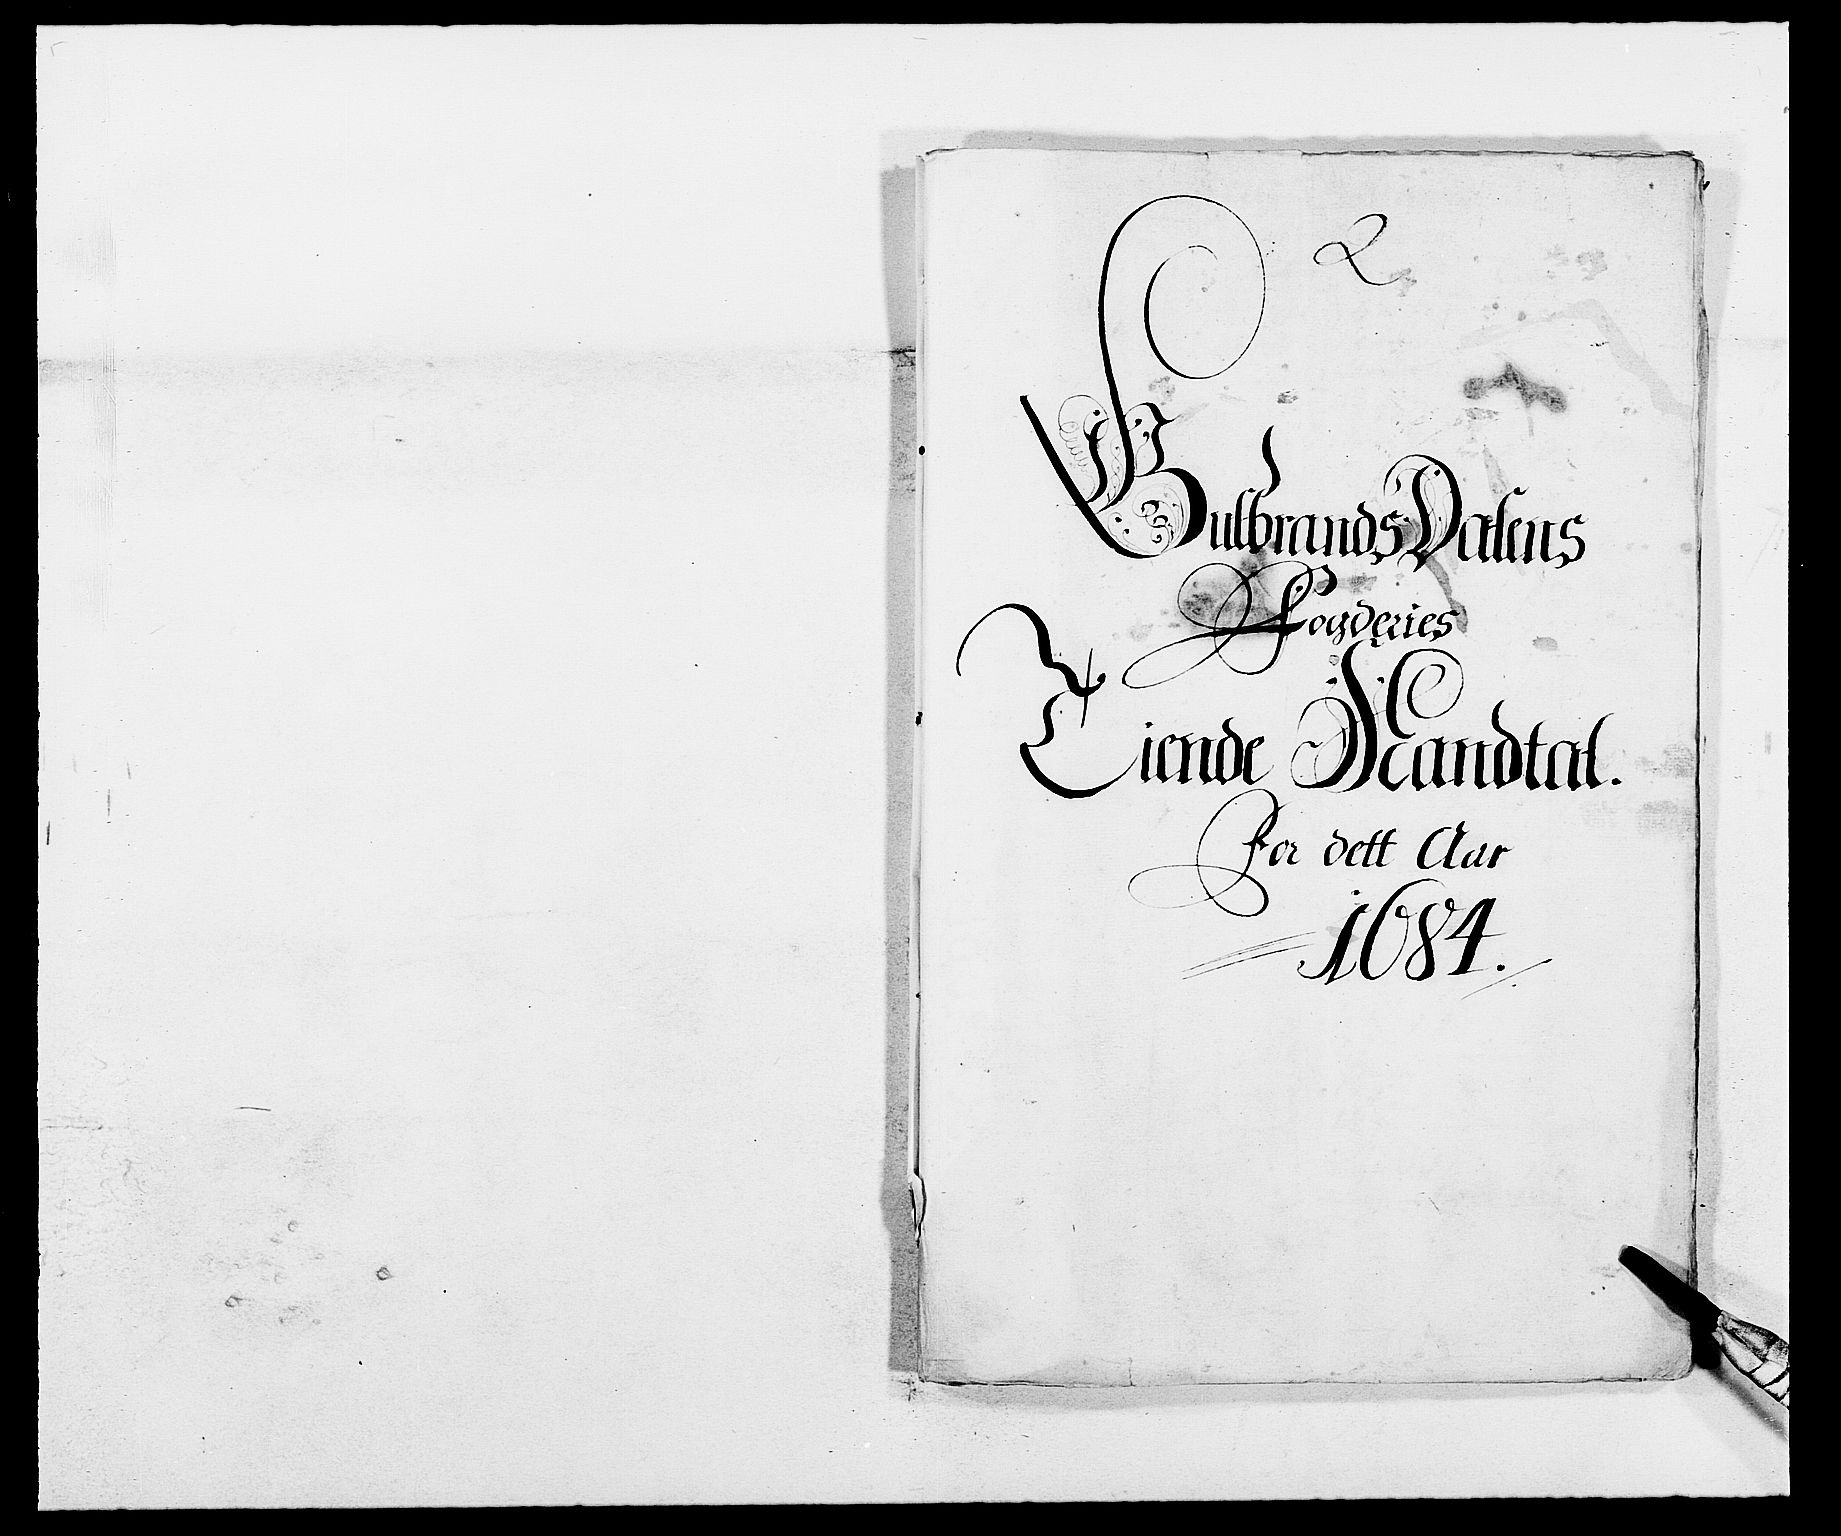 RA, Rentekammeret inntil 1814, Reviderte regnskaper, Fogderegnskap, R17/L1159: Fogderegnskap Gudbrandsdal, 1682-1689, s. 262